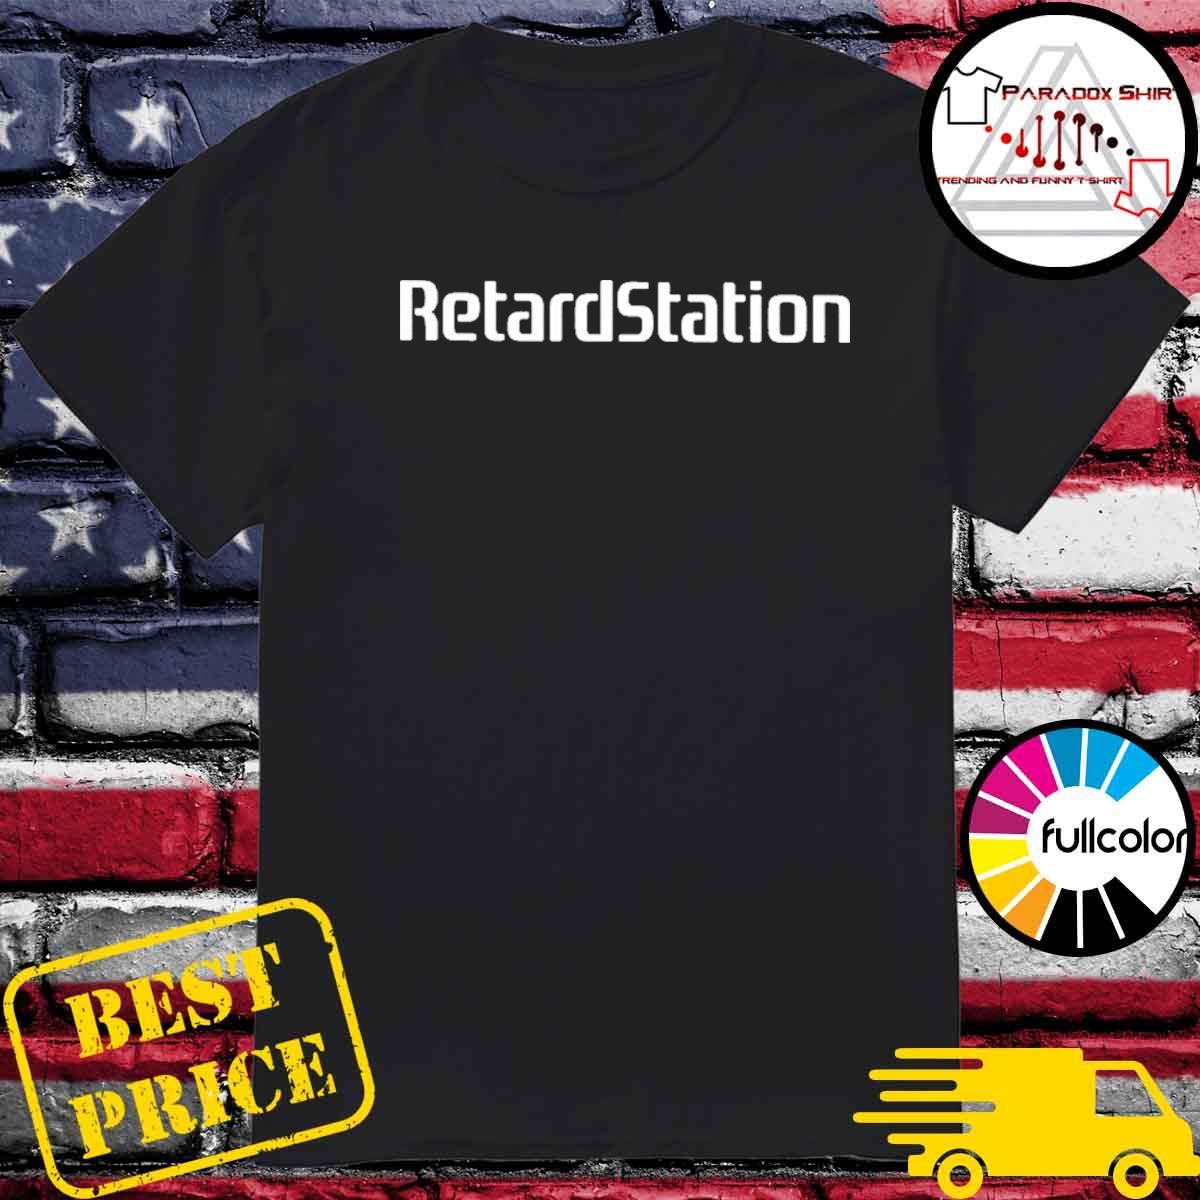 Retardstation shirt